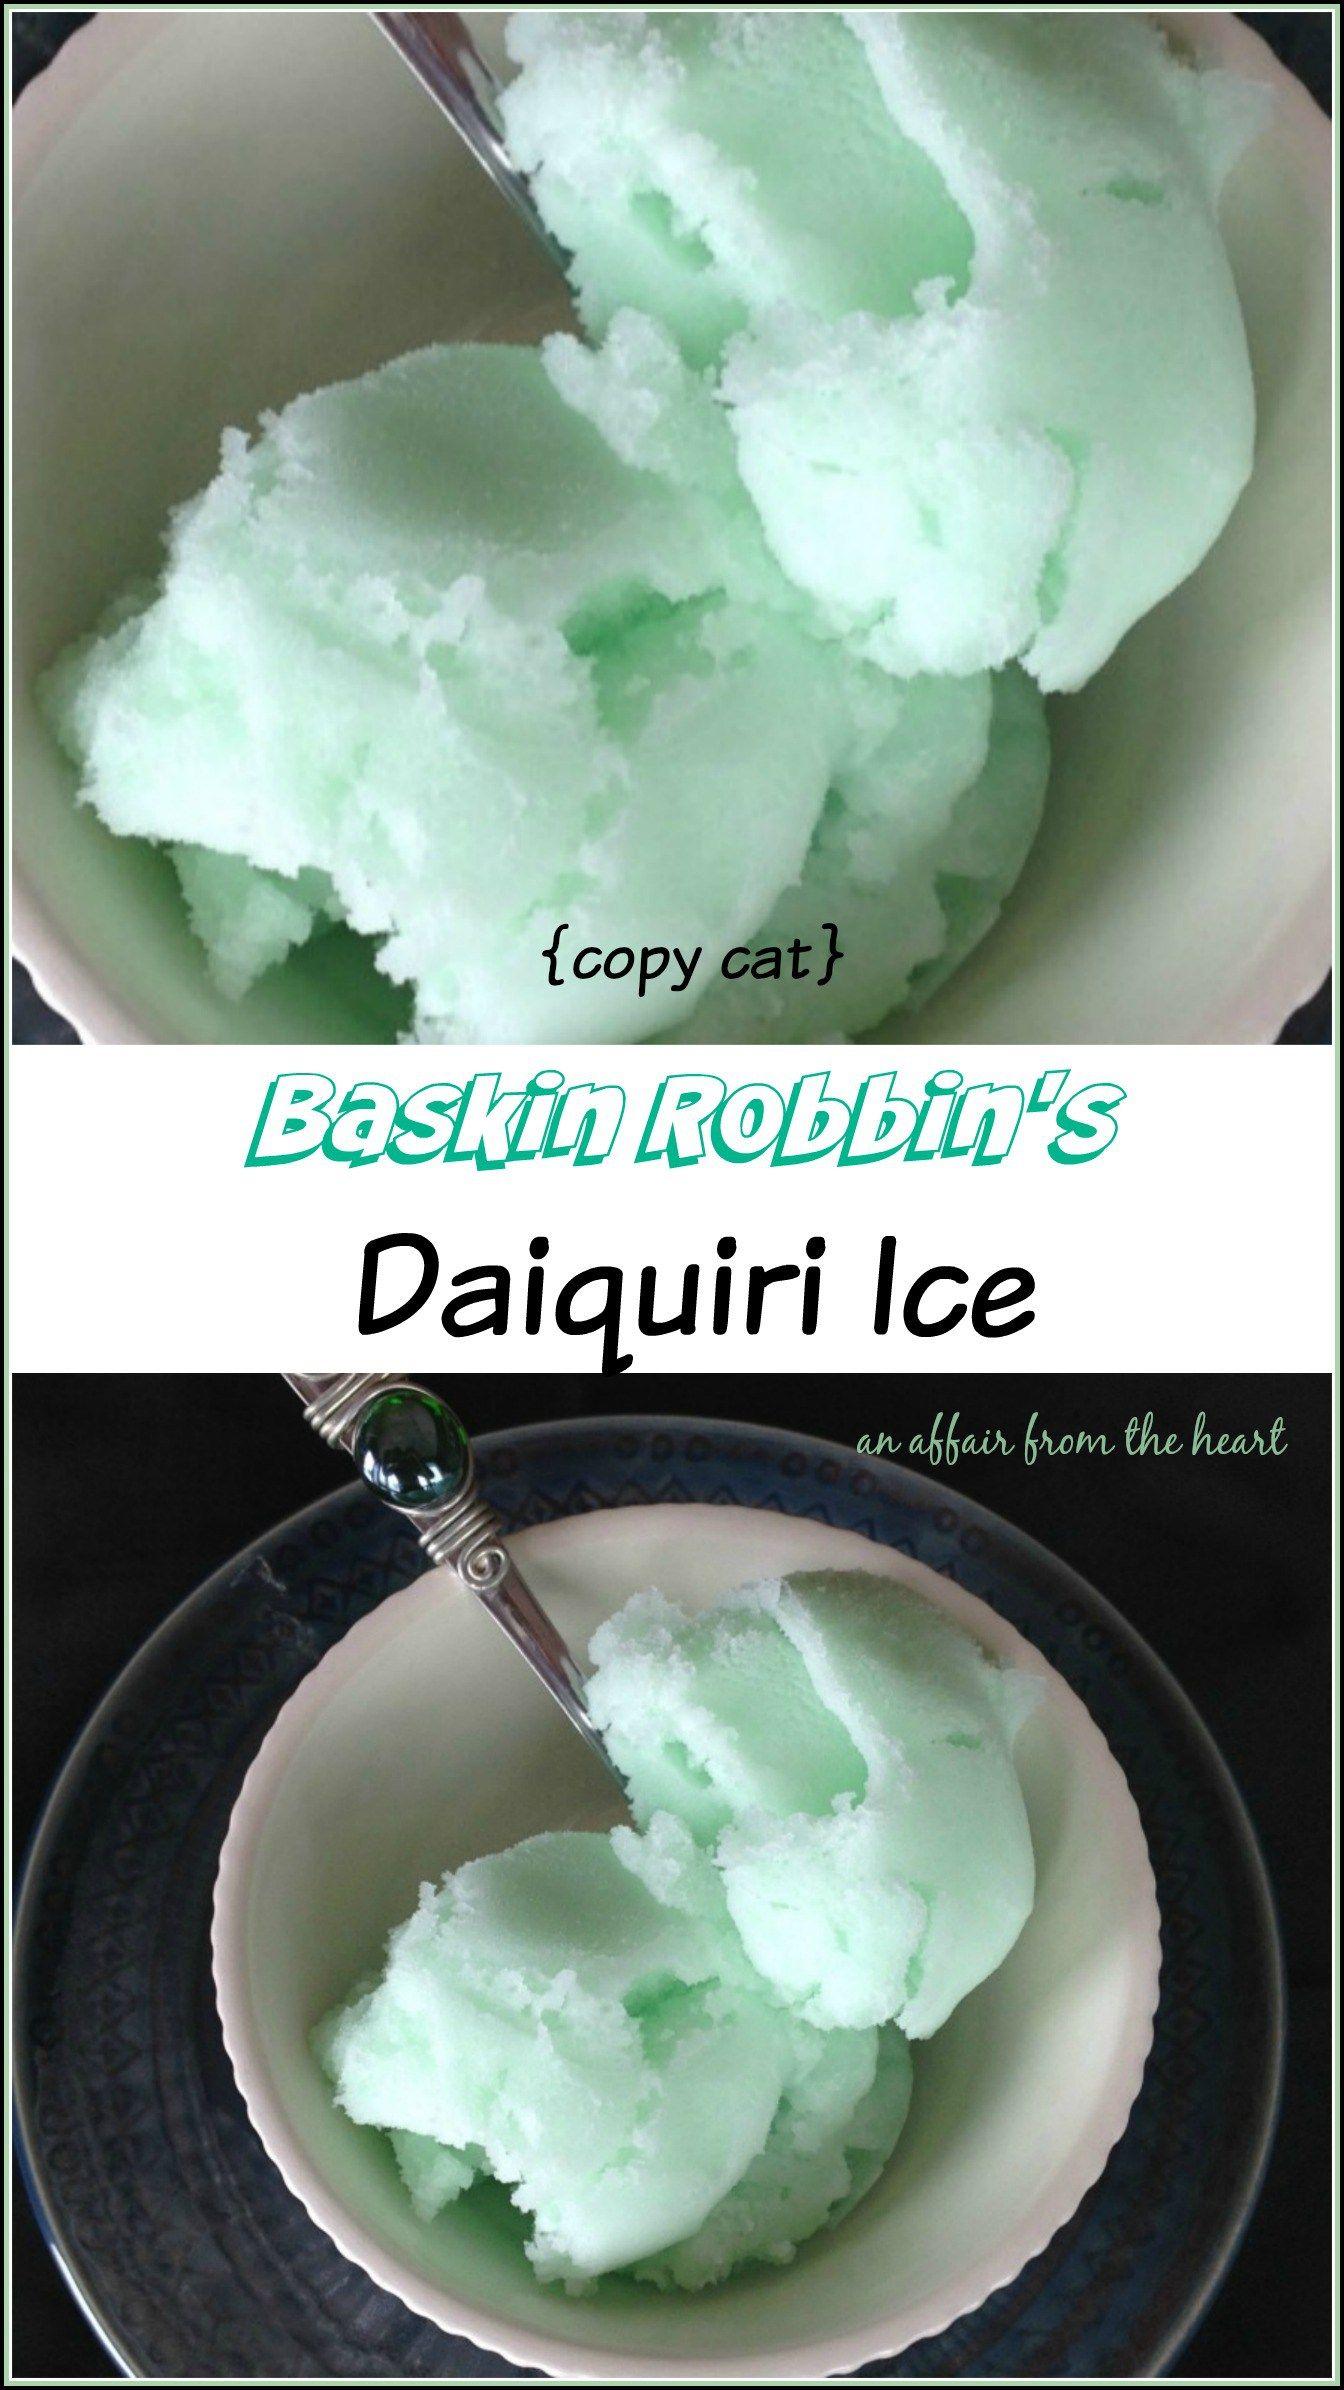 (copy cat) Baskin Robbins Daiquiri Ice Recipe Italian